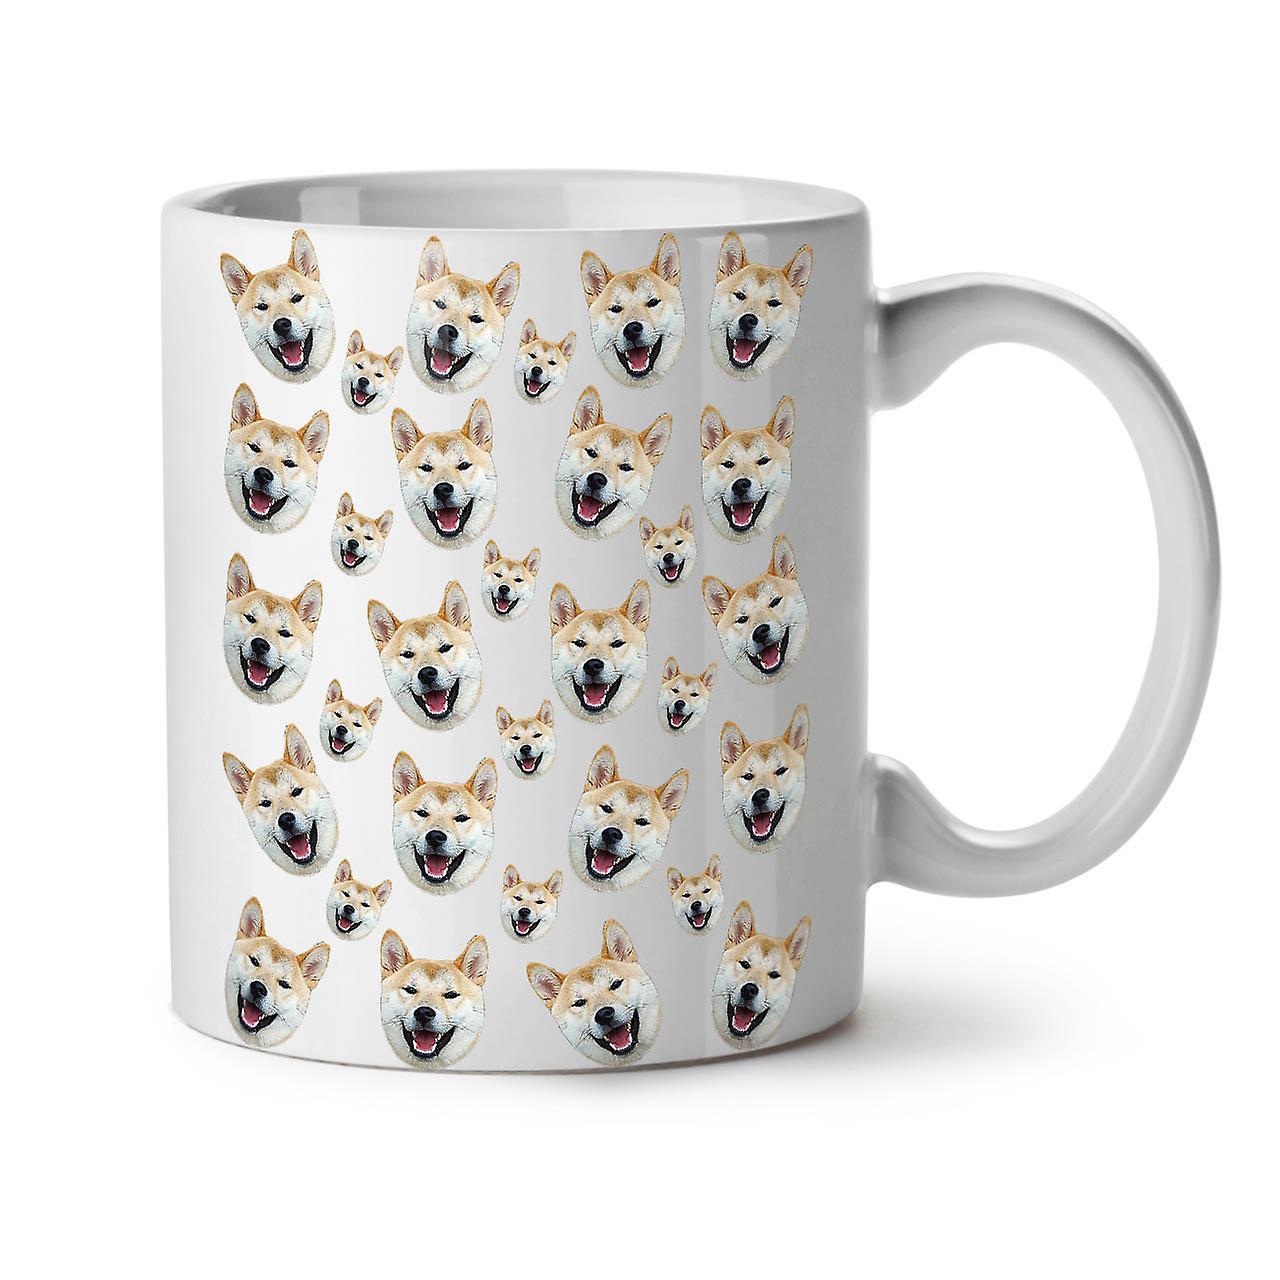 Coffee Mug Meme OzWellcoda New 11 Tea White Ceramic OPXTikZu